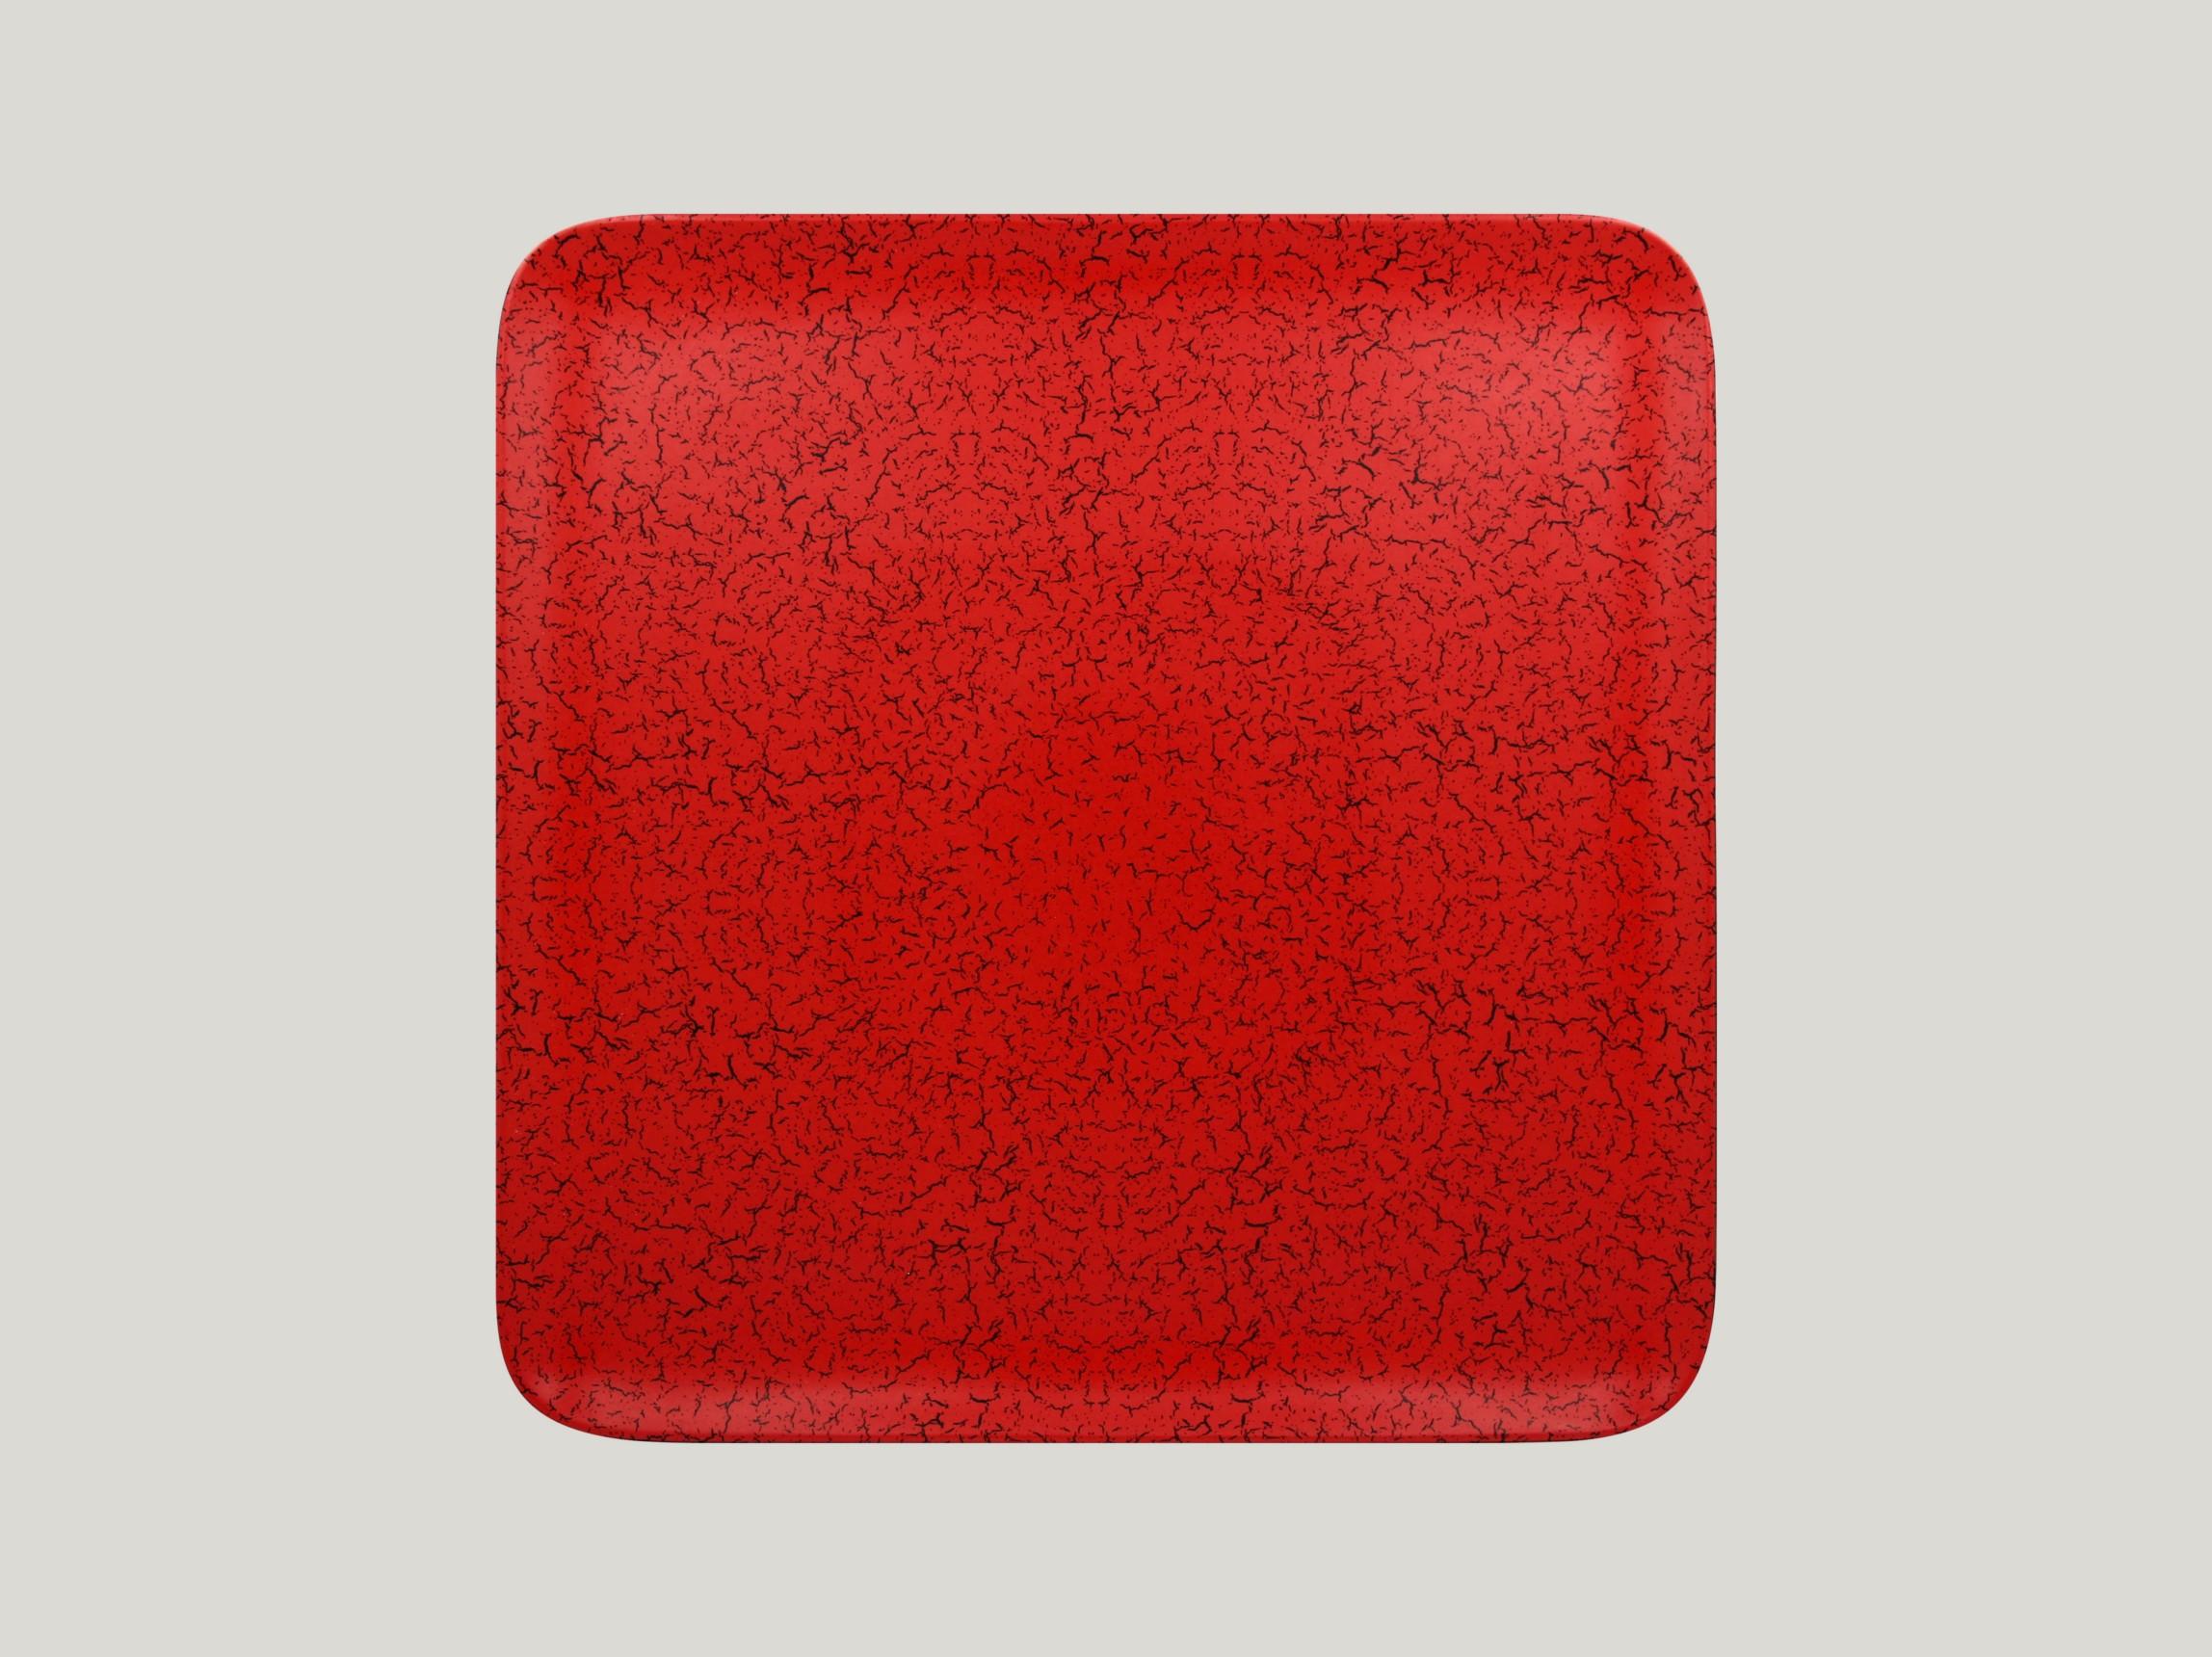 Talíř čtvercový 30 x 30 cm - červená